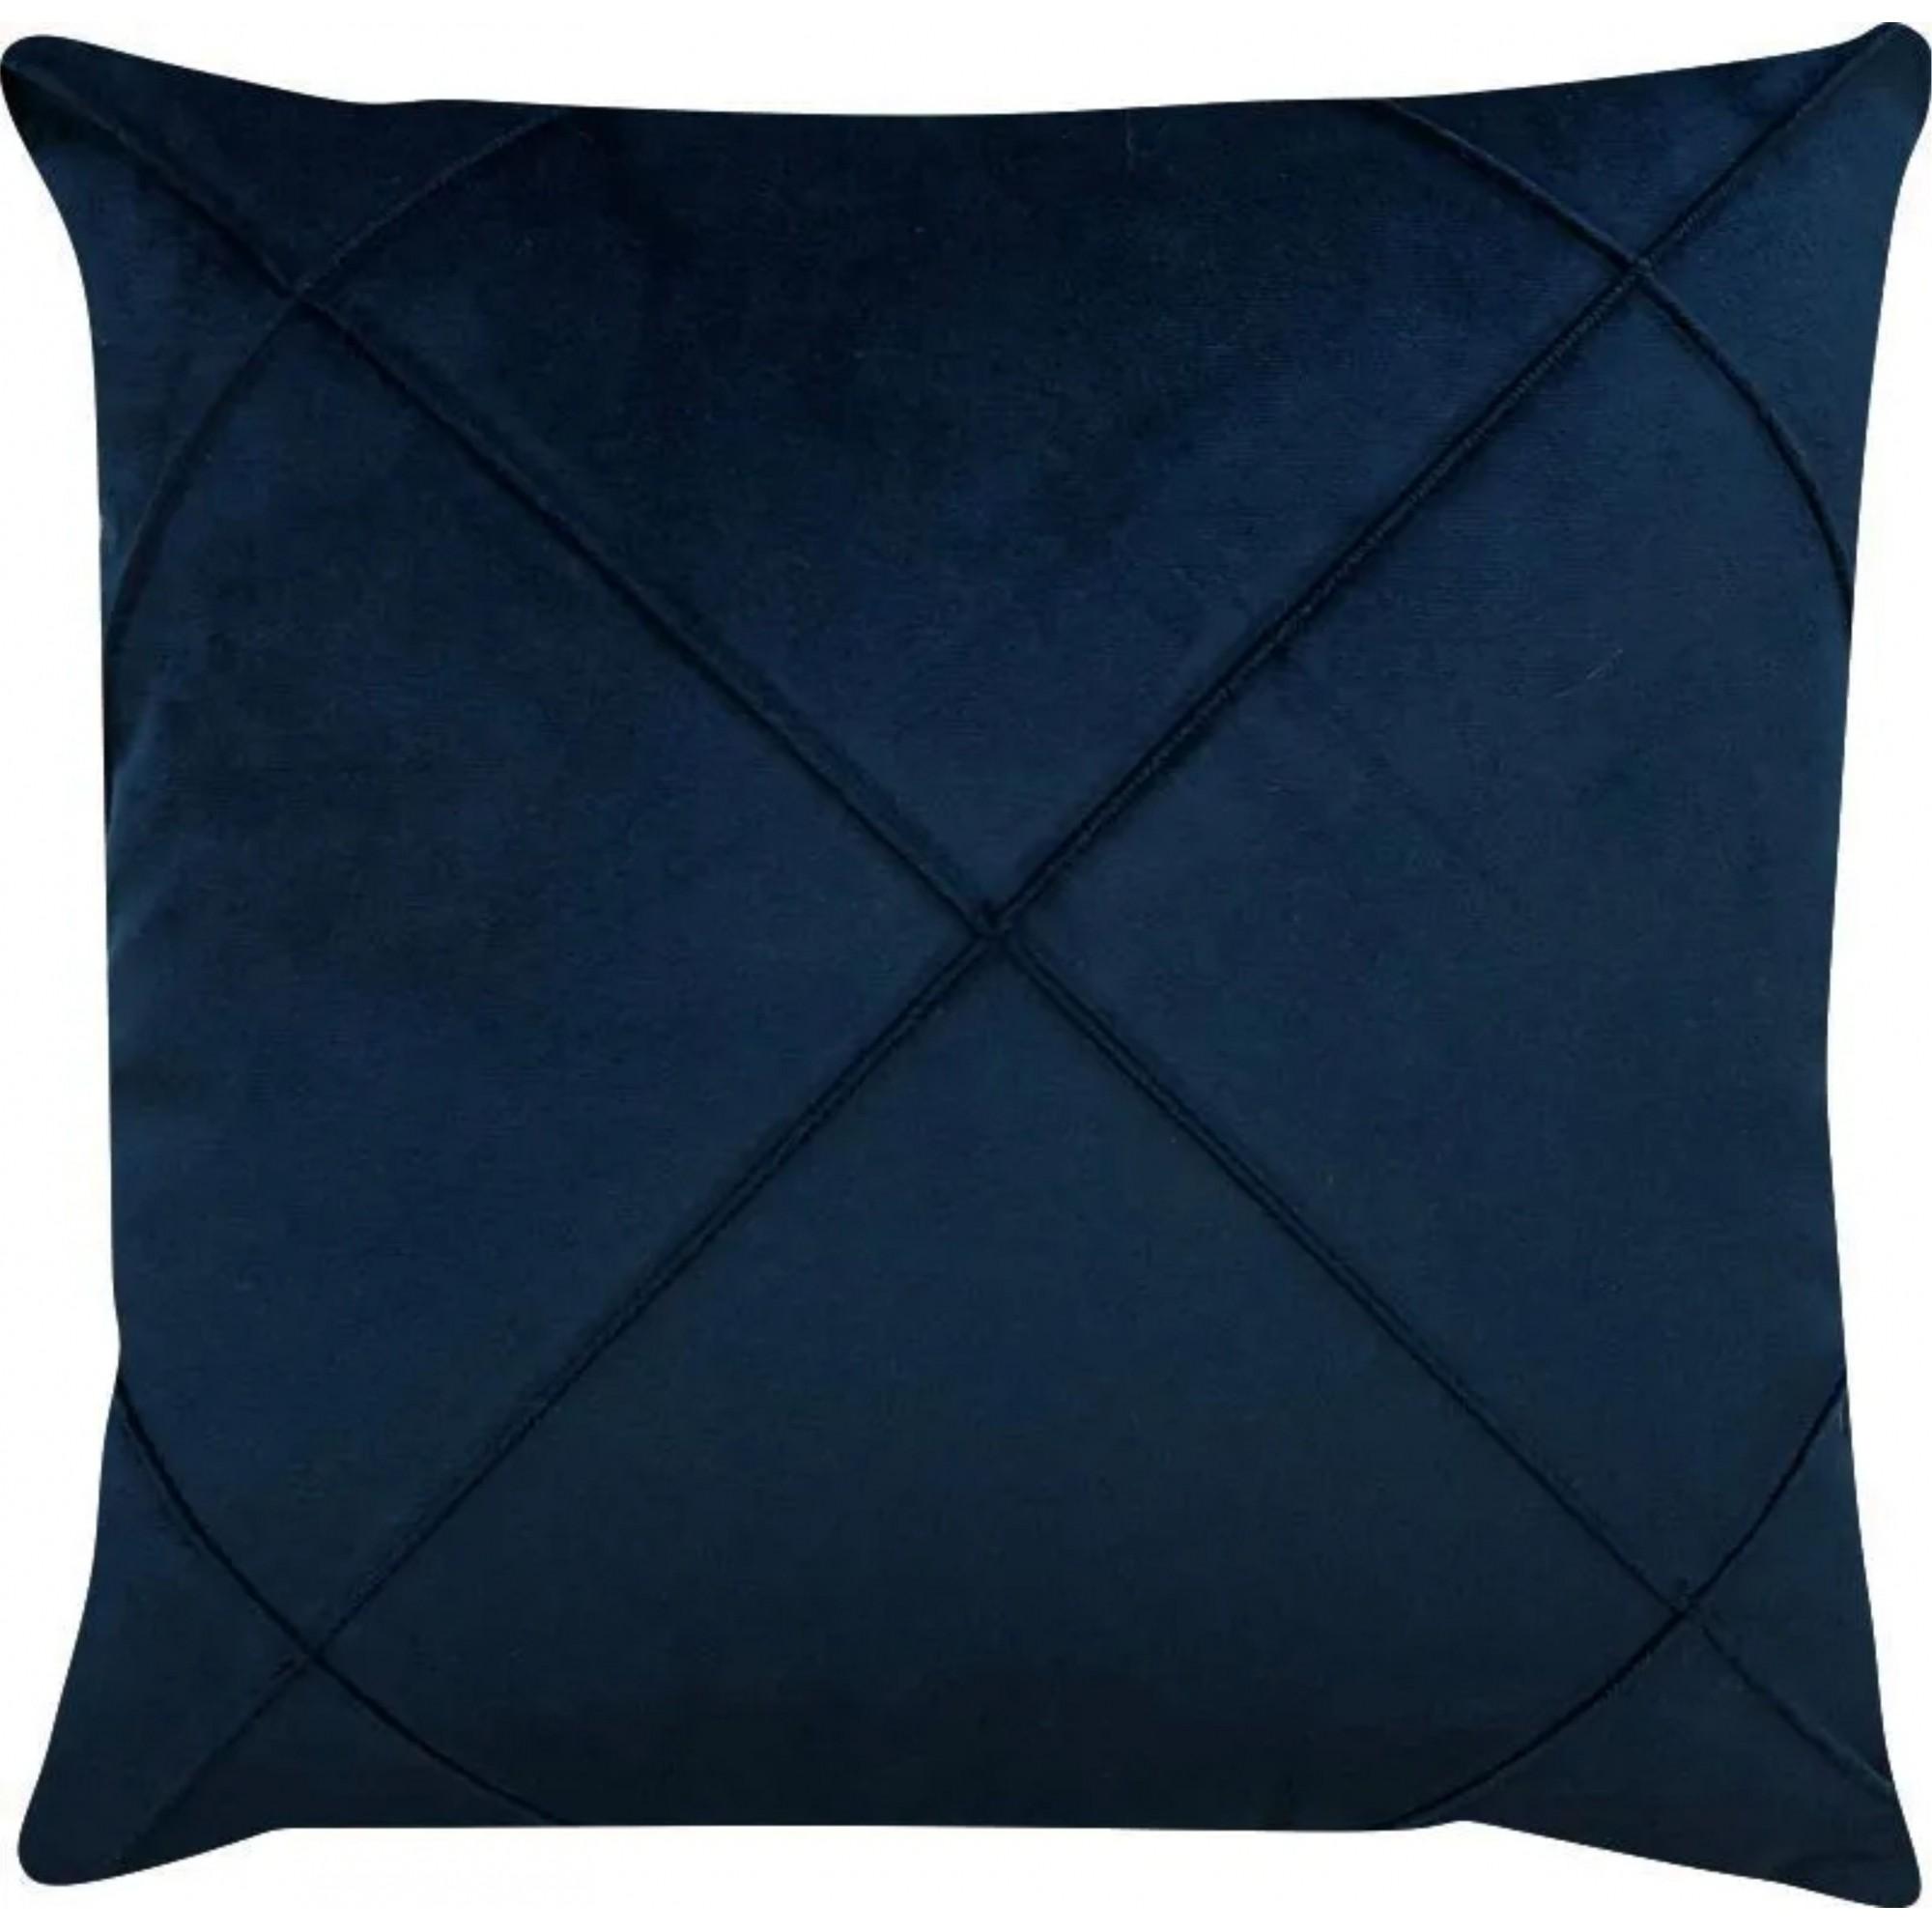 Capa de Almofada Drapeada 50 x 50 Veludo Azul Marinho